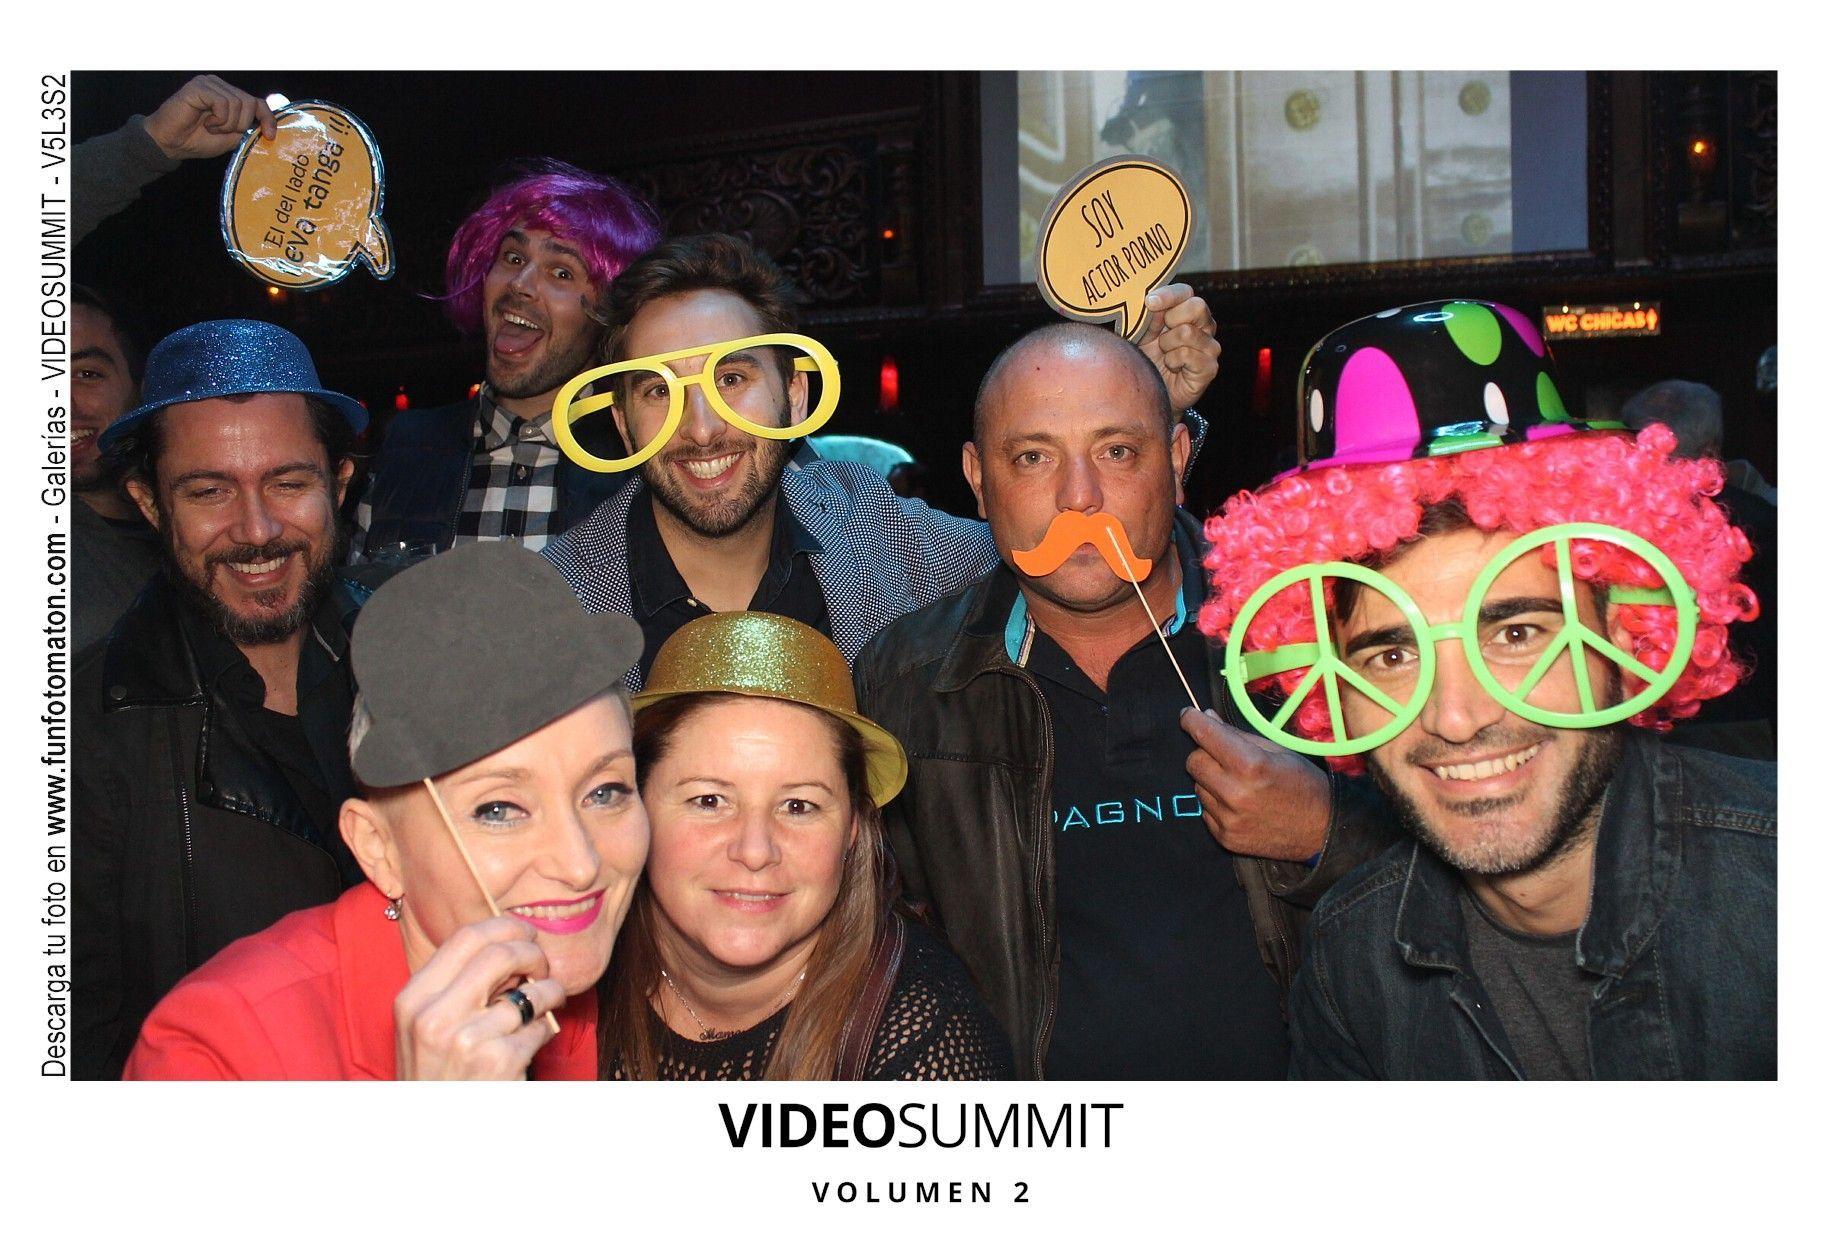 videosummit-vol2-club-party-060